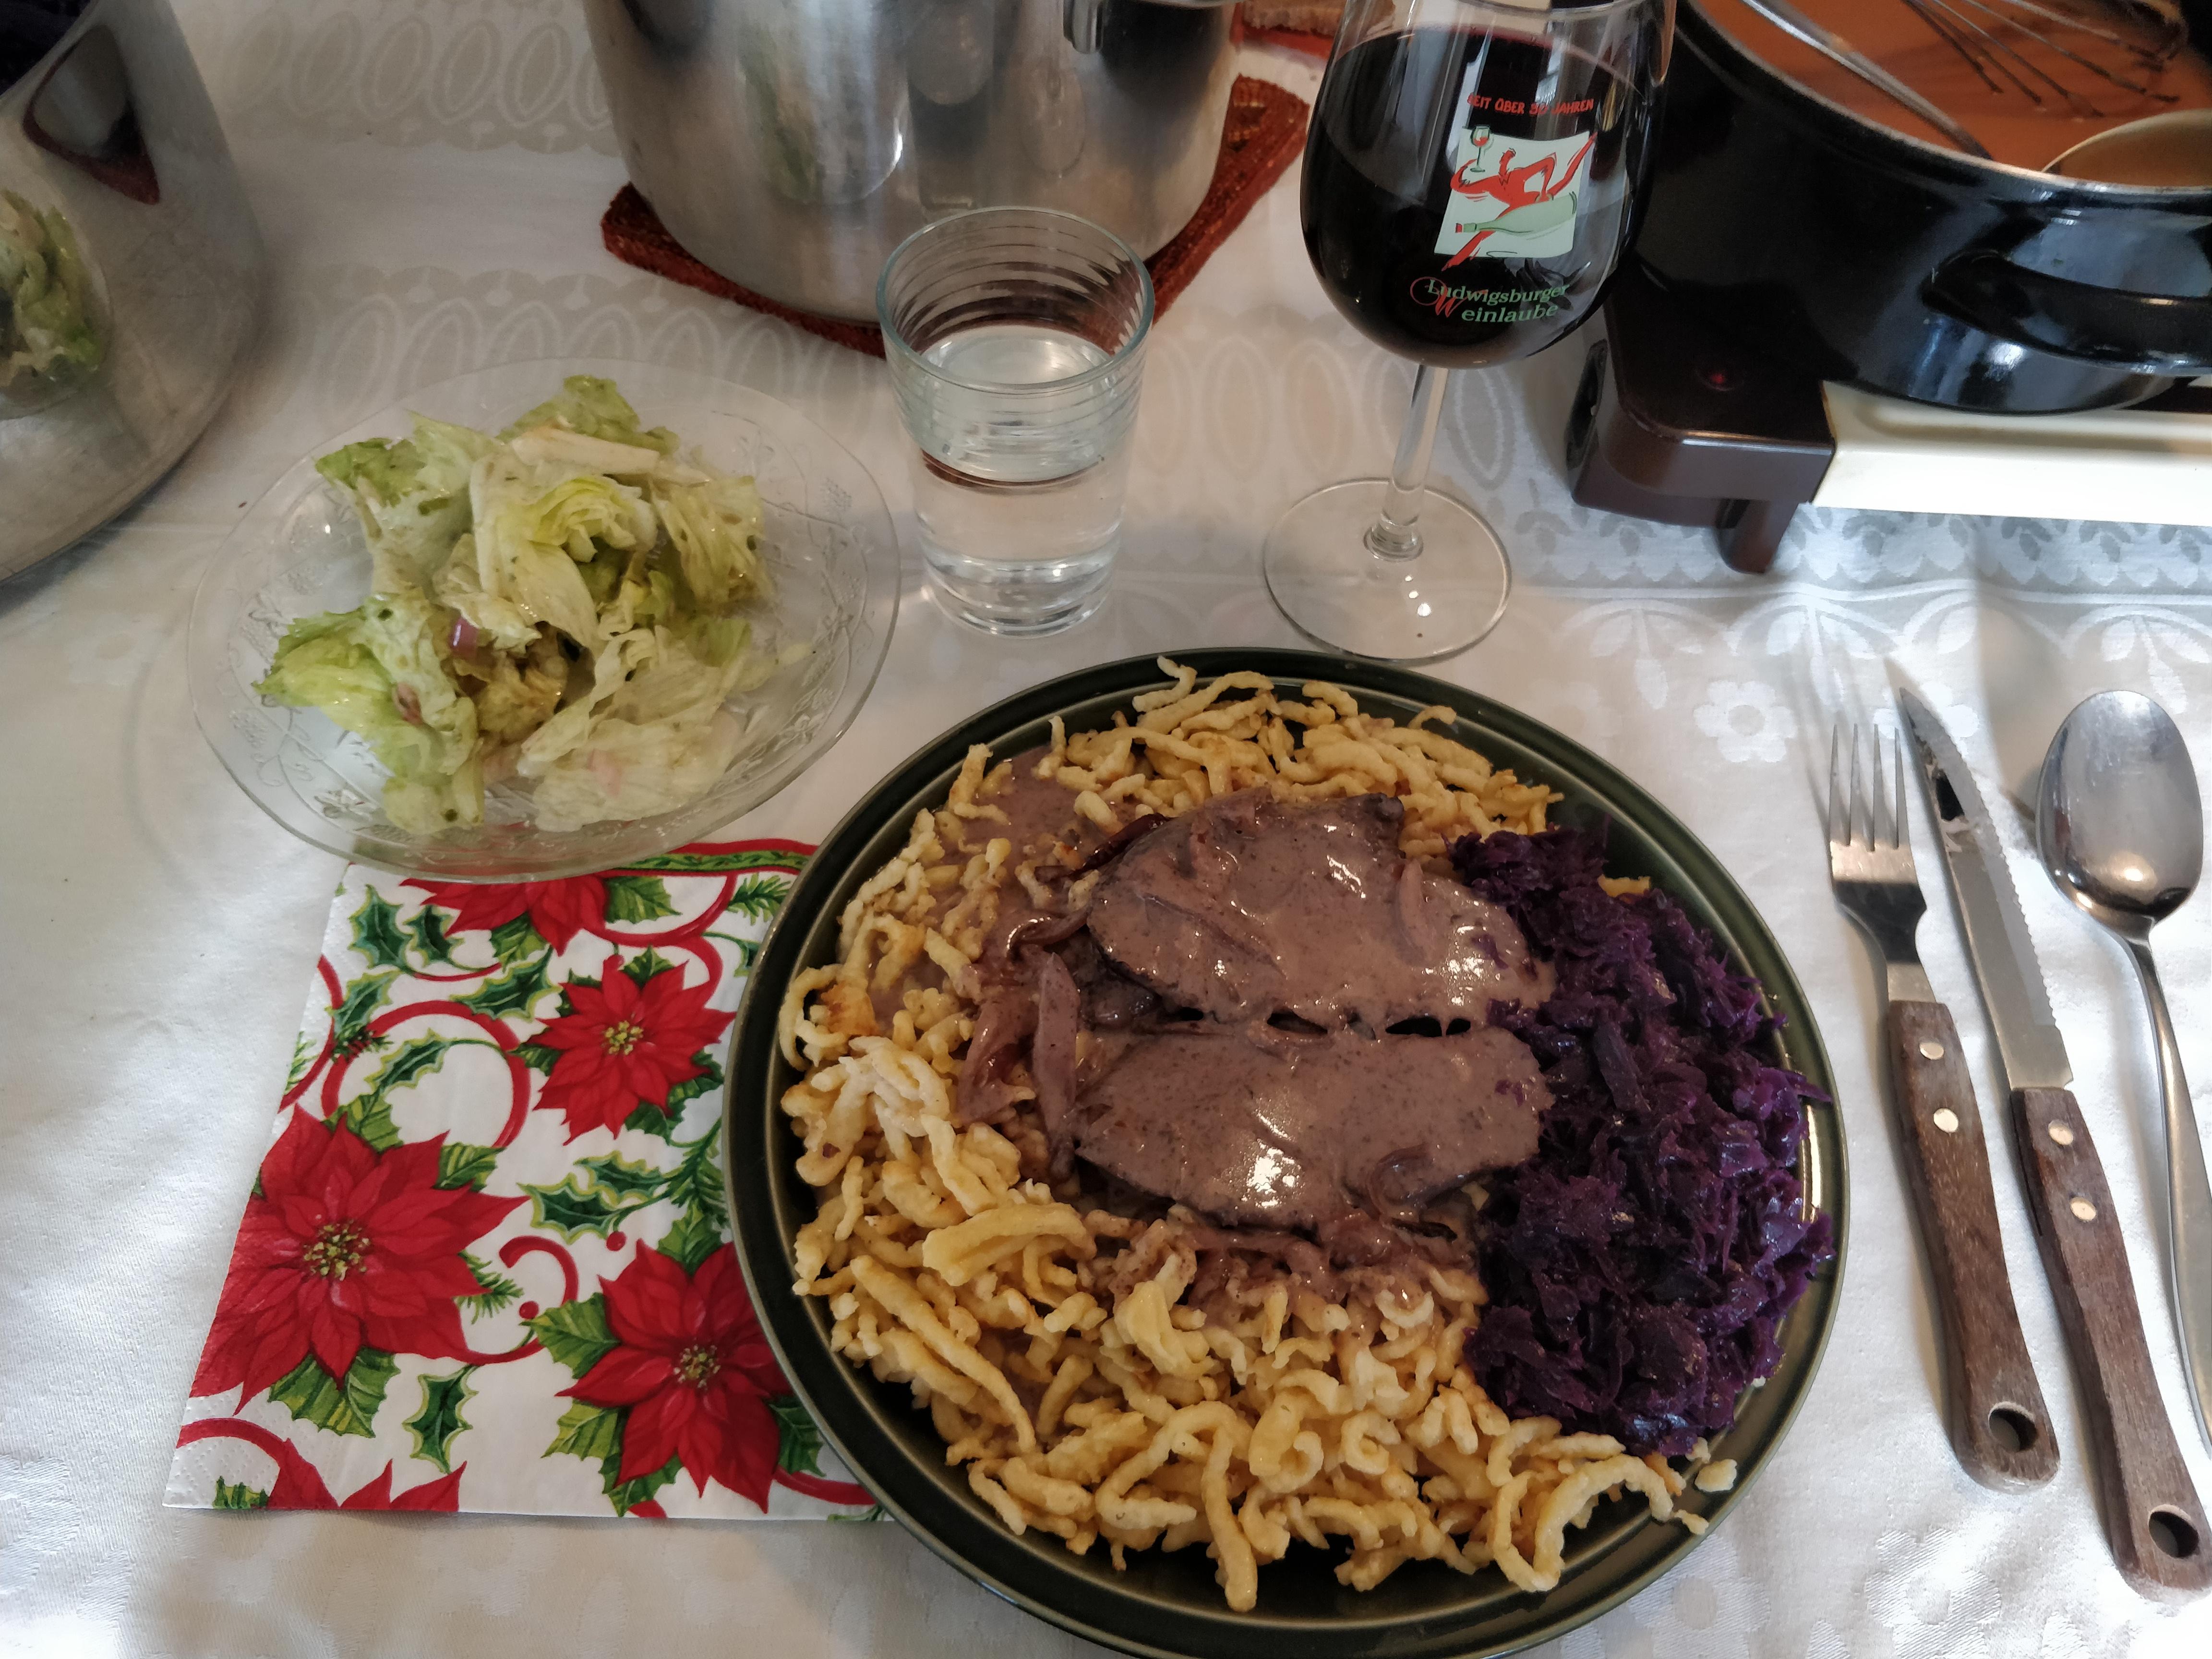 https://foodloader.net/nico_2018-12-25_rehbraten-spaetzle-rotkraut-salat.jpg